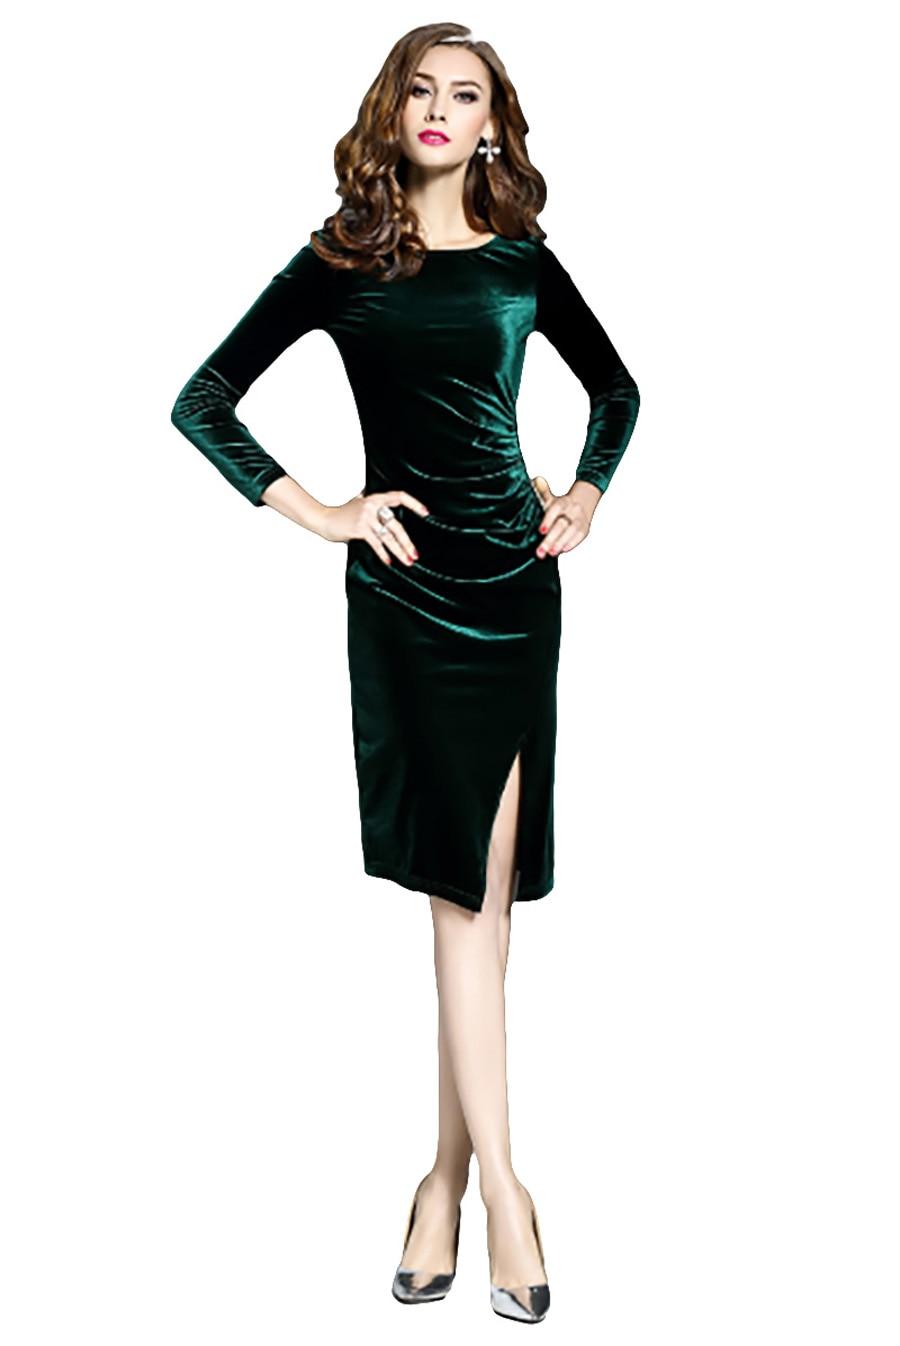 sommer neue schlank dress roc langarm knielangen Flying party kleider herbst outfit frauen abend casual mOn0v8wN